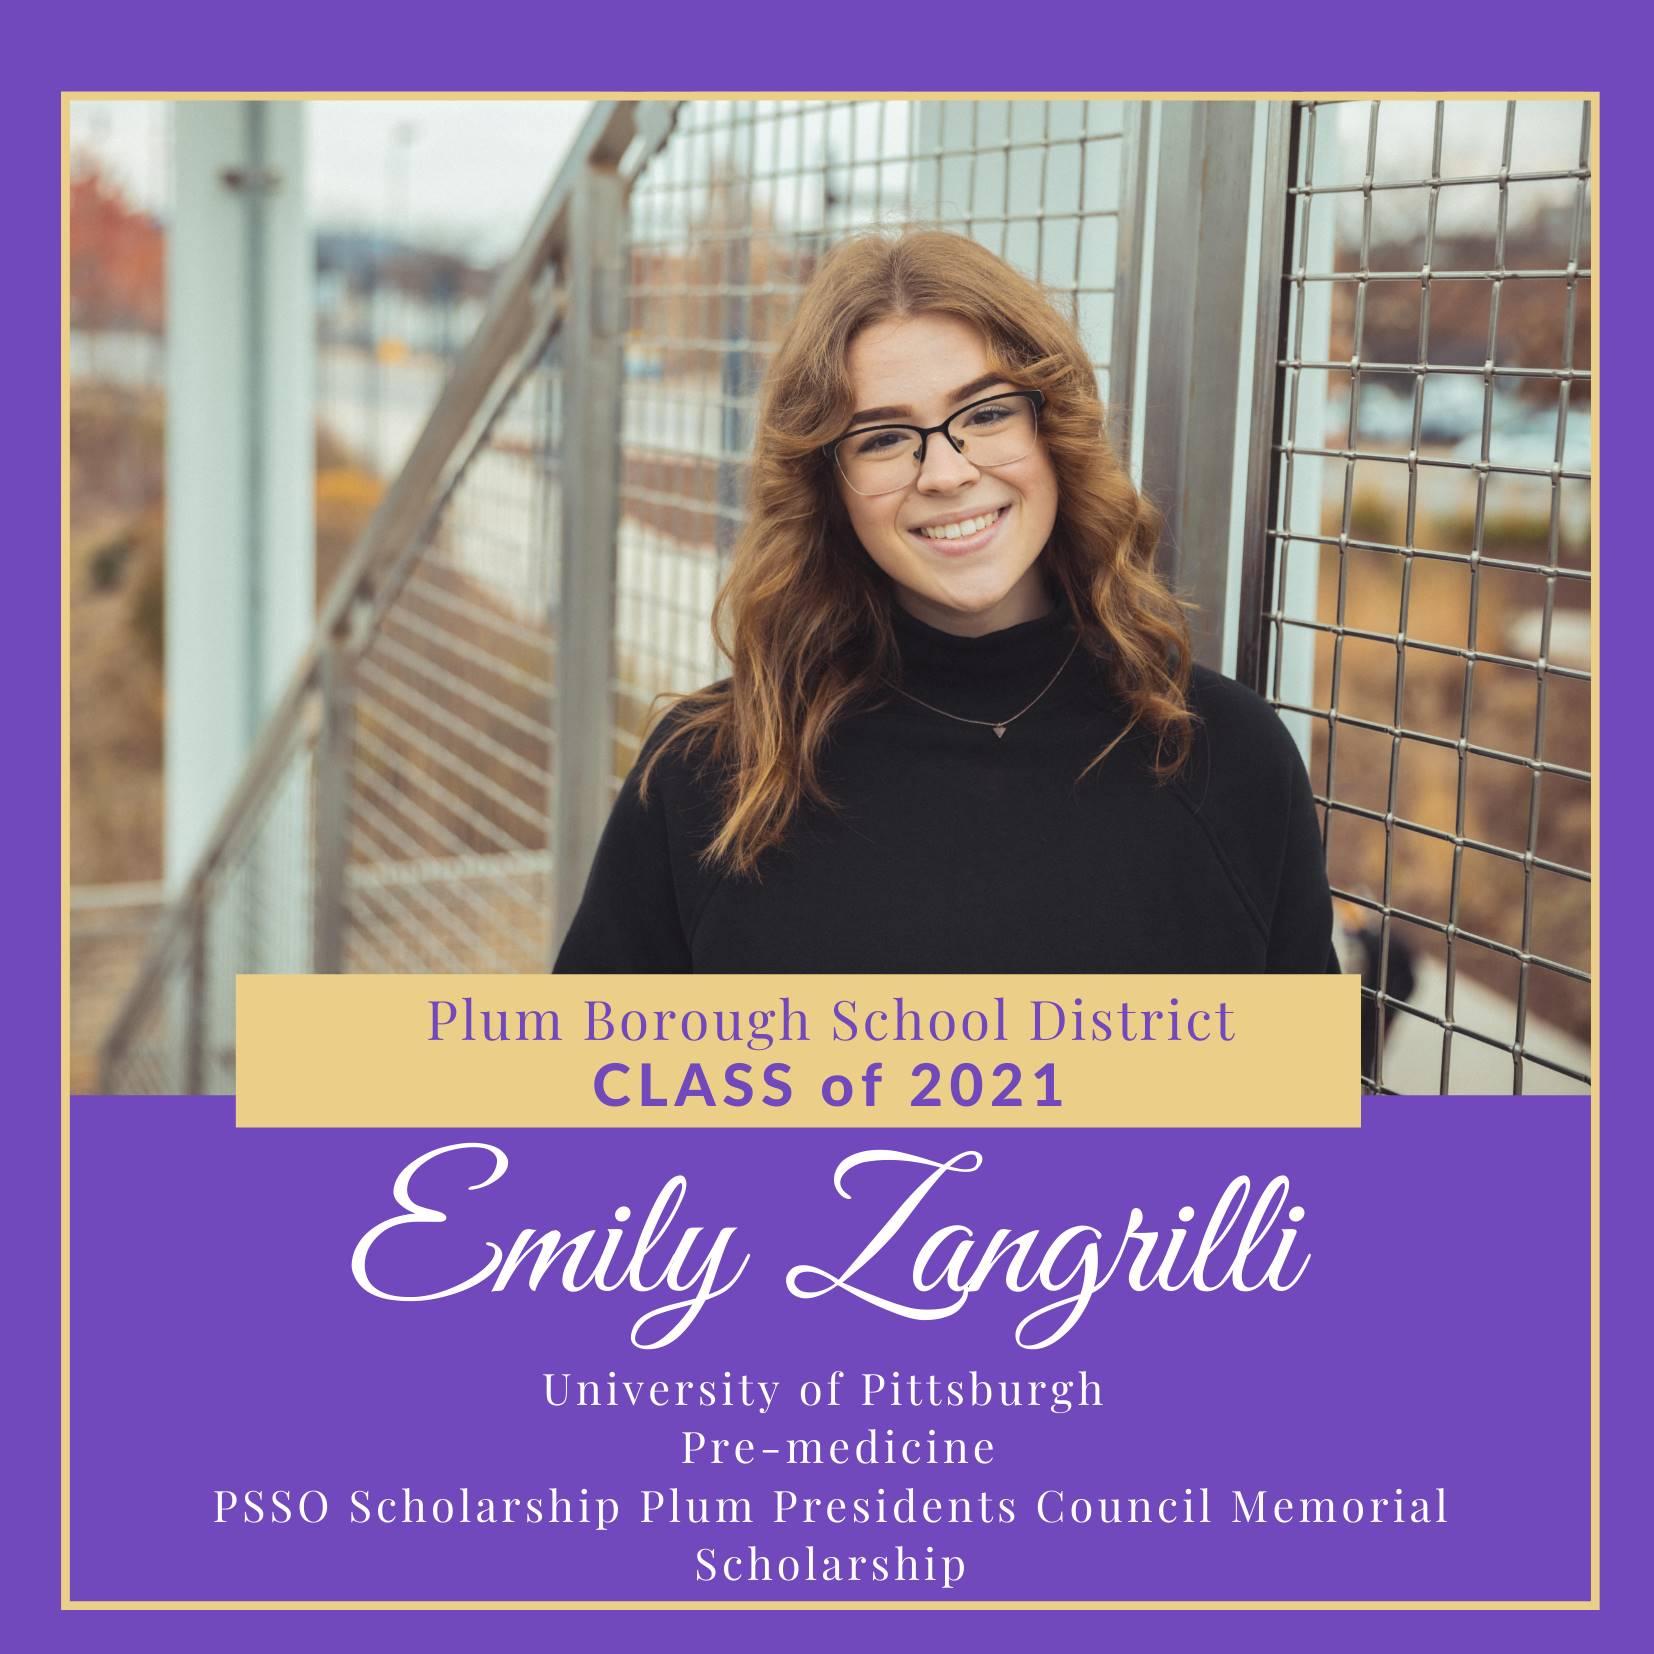 Congratulations to Emily Zangrilli, Class of 2021!